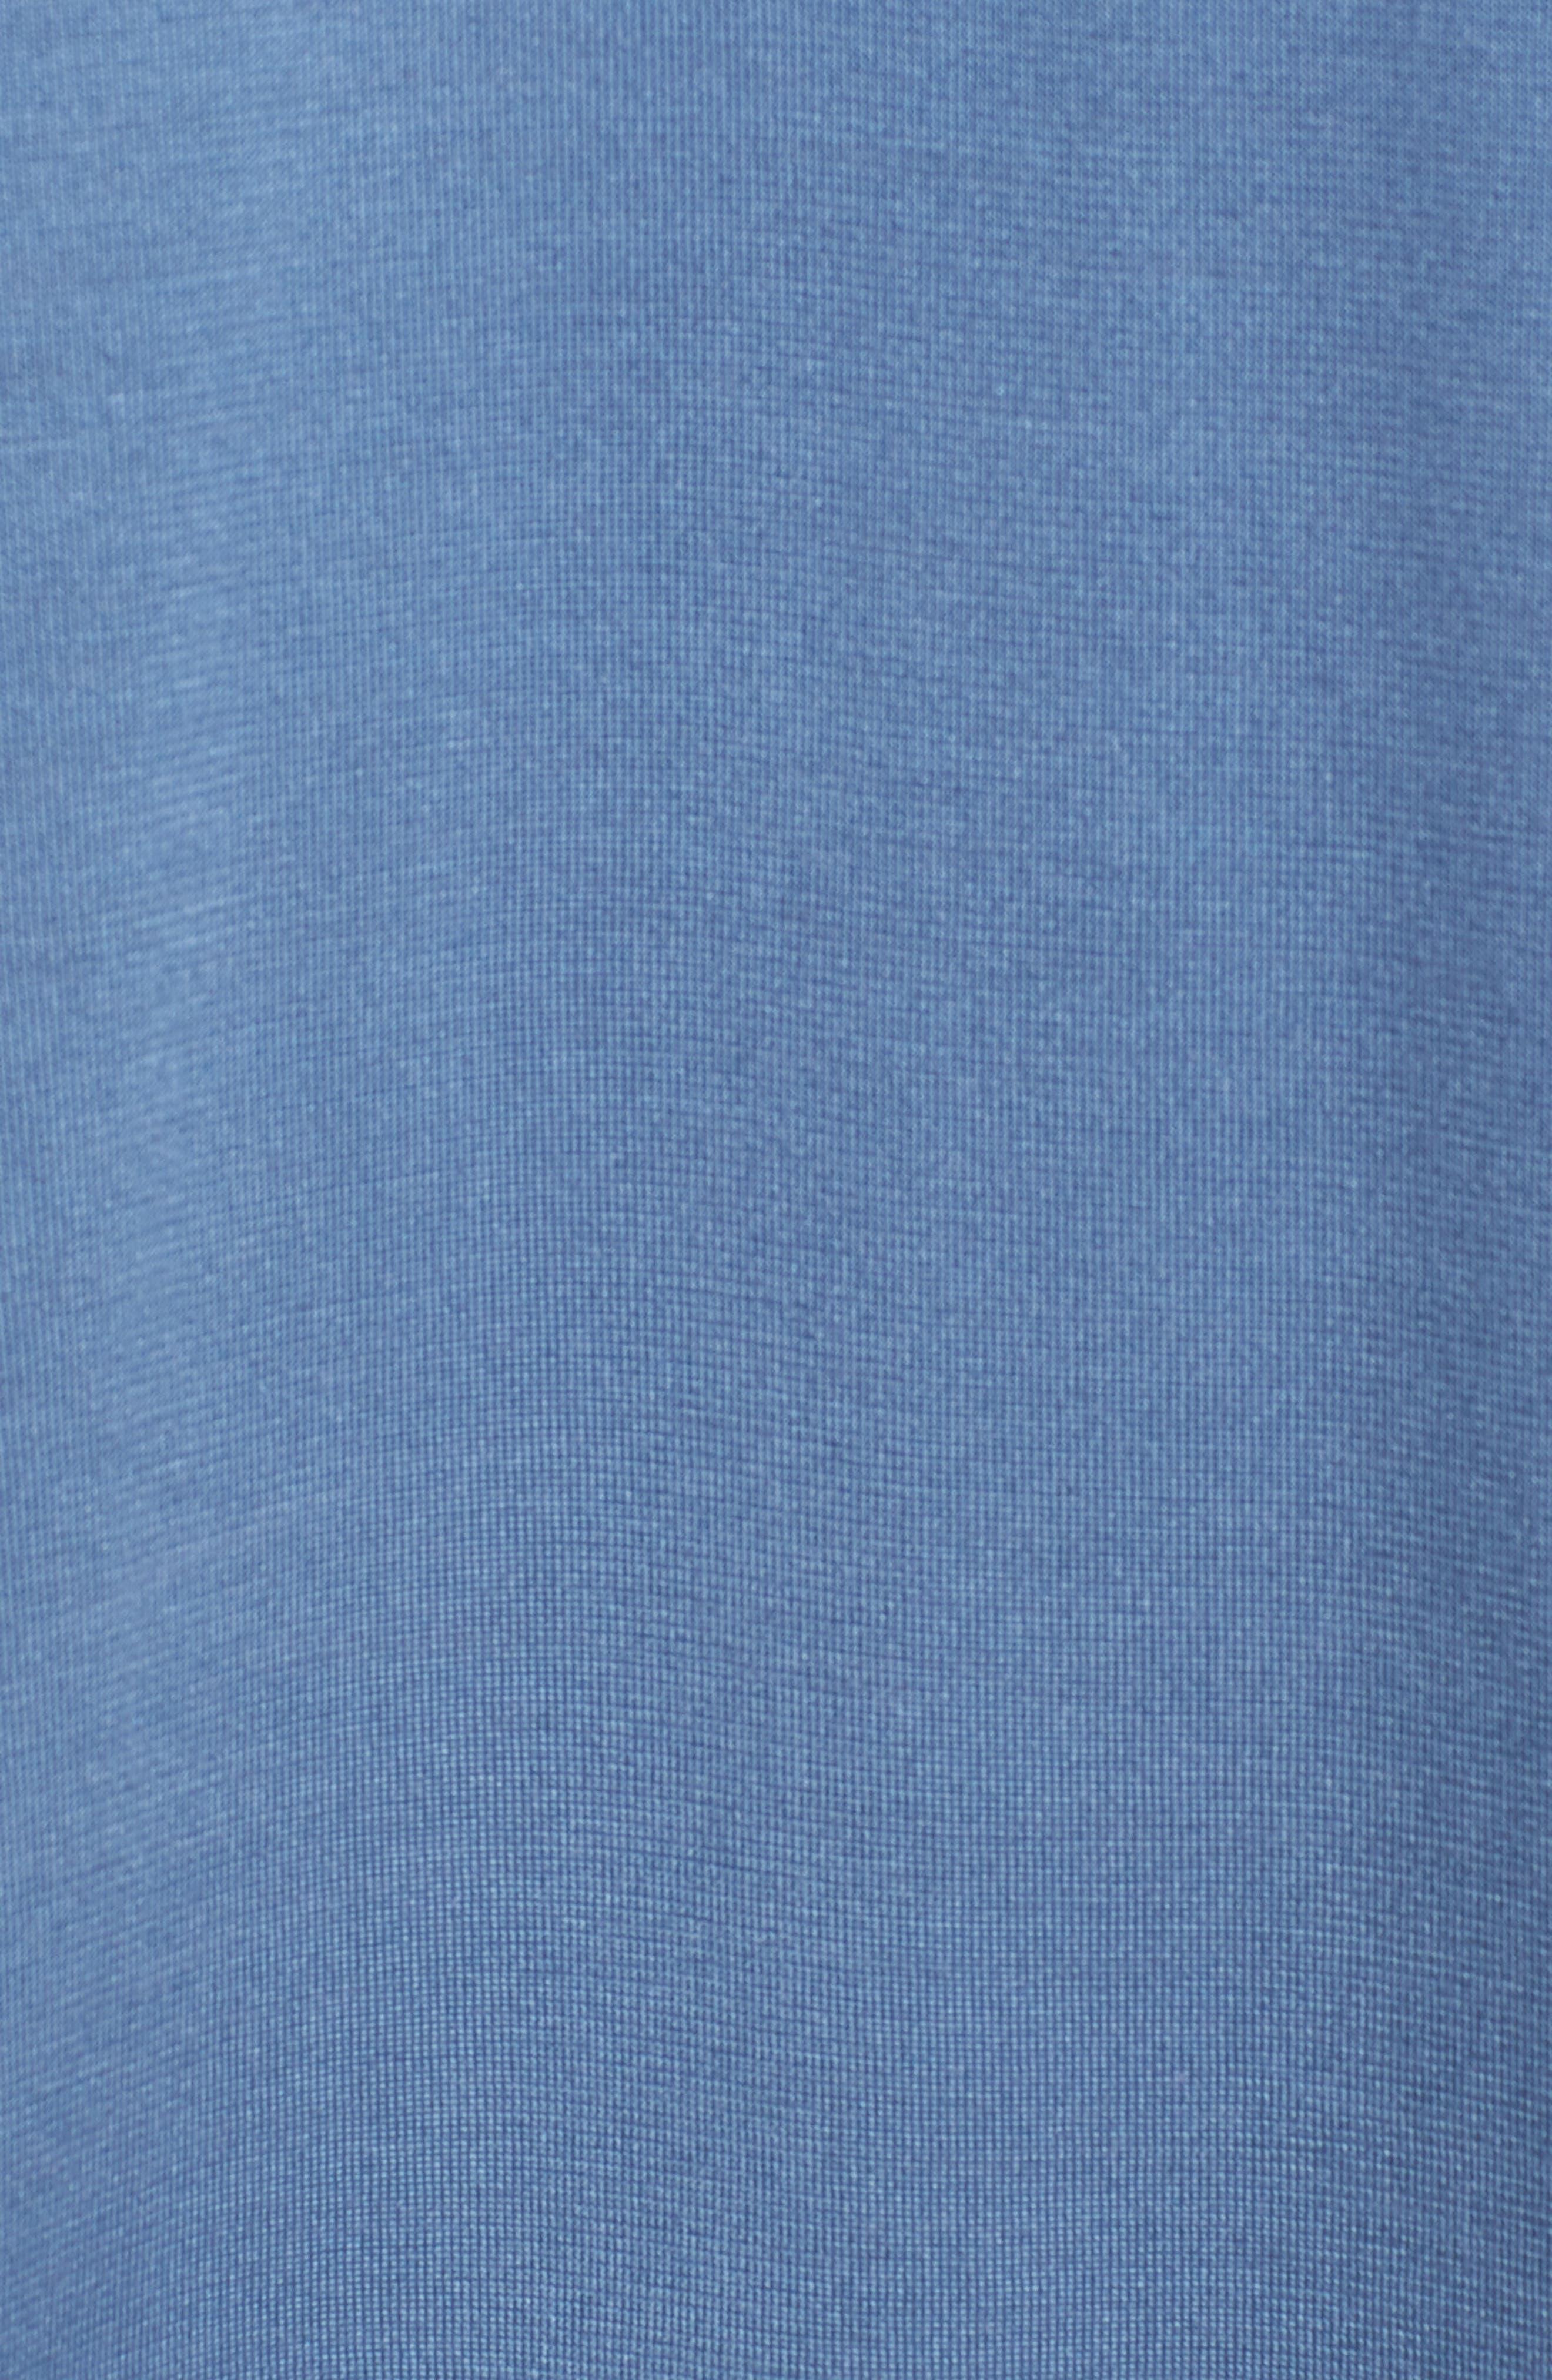 Incisive Silk & Cotton Short Sleeve Sport Shirt,                             Alternate thumbnail 5, color,                             Iris